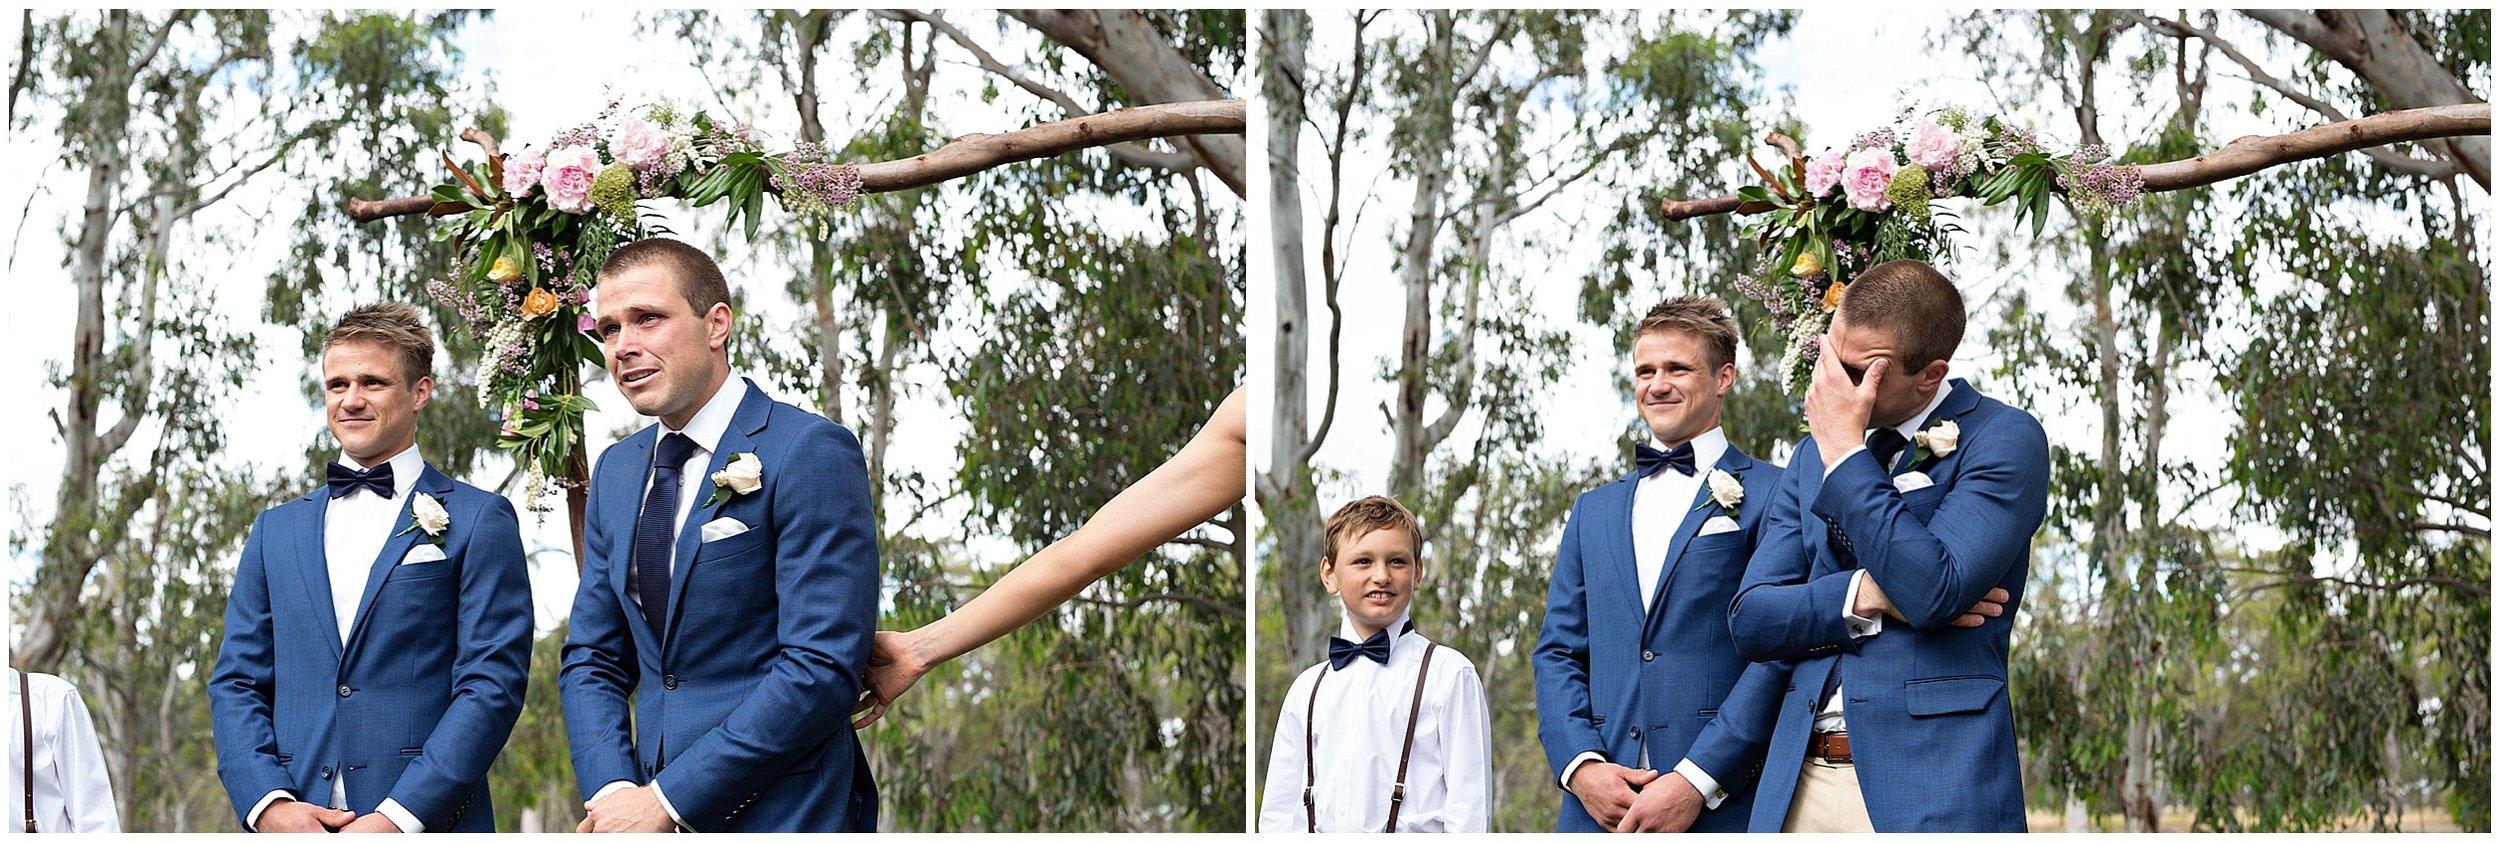 shepparton-wedding-photographer_0162.jpg